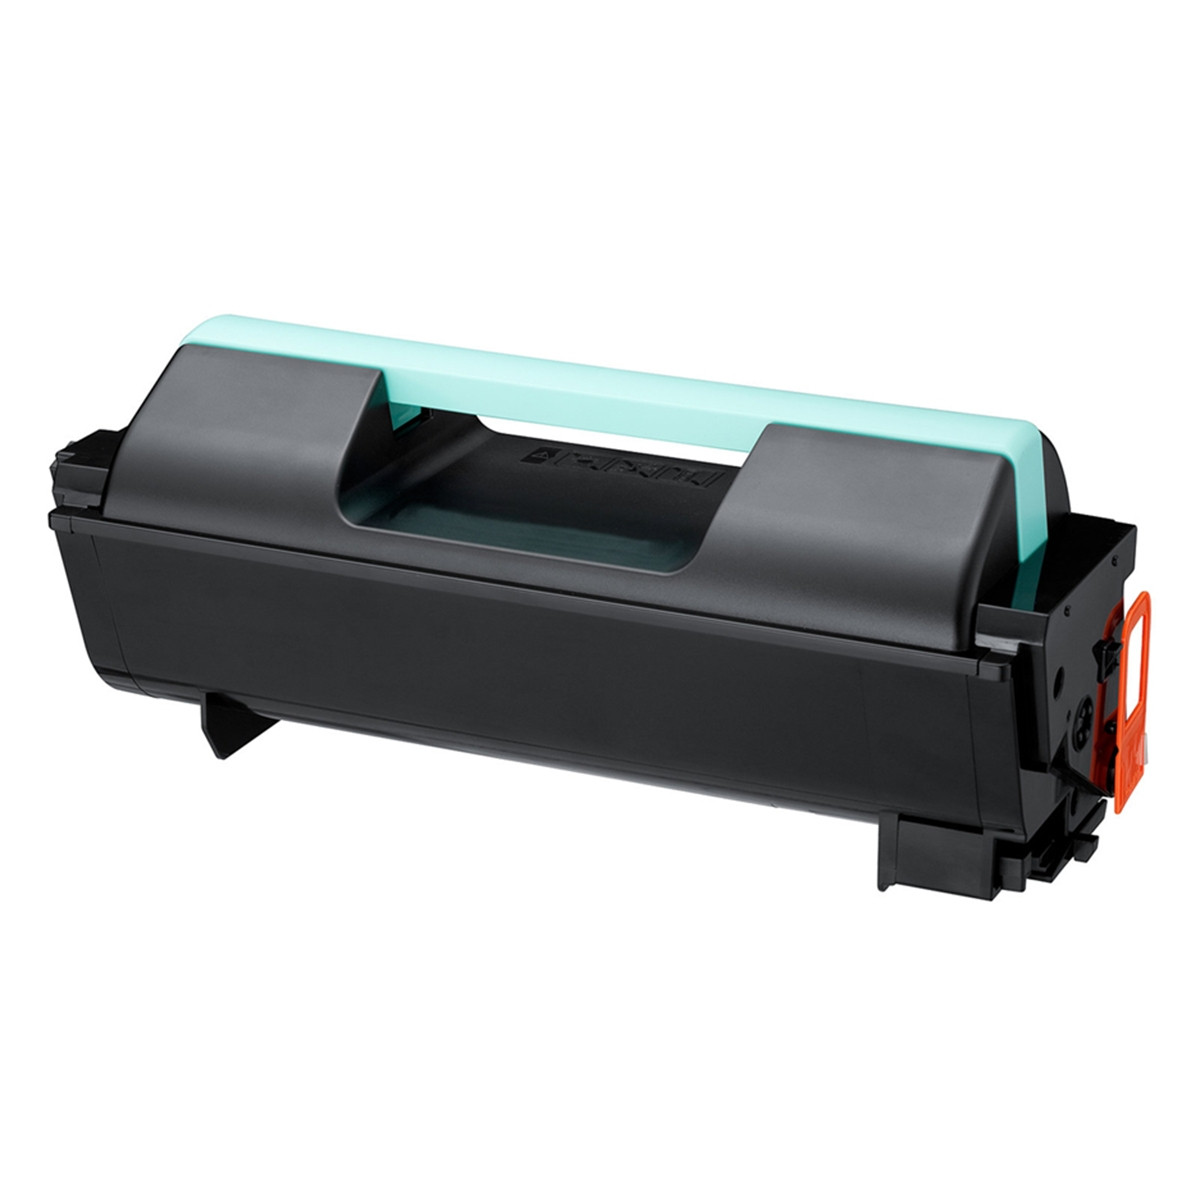 Toner Compatível Samsung MLT-D309L D309 | ML5510 ML6510 ML-5510ND ML-6510DN | Importado 30k